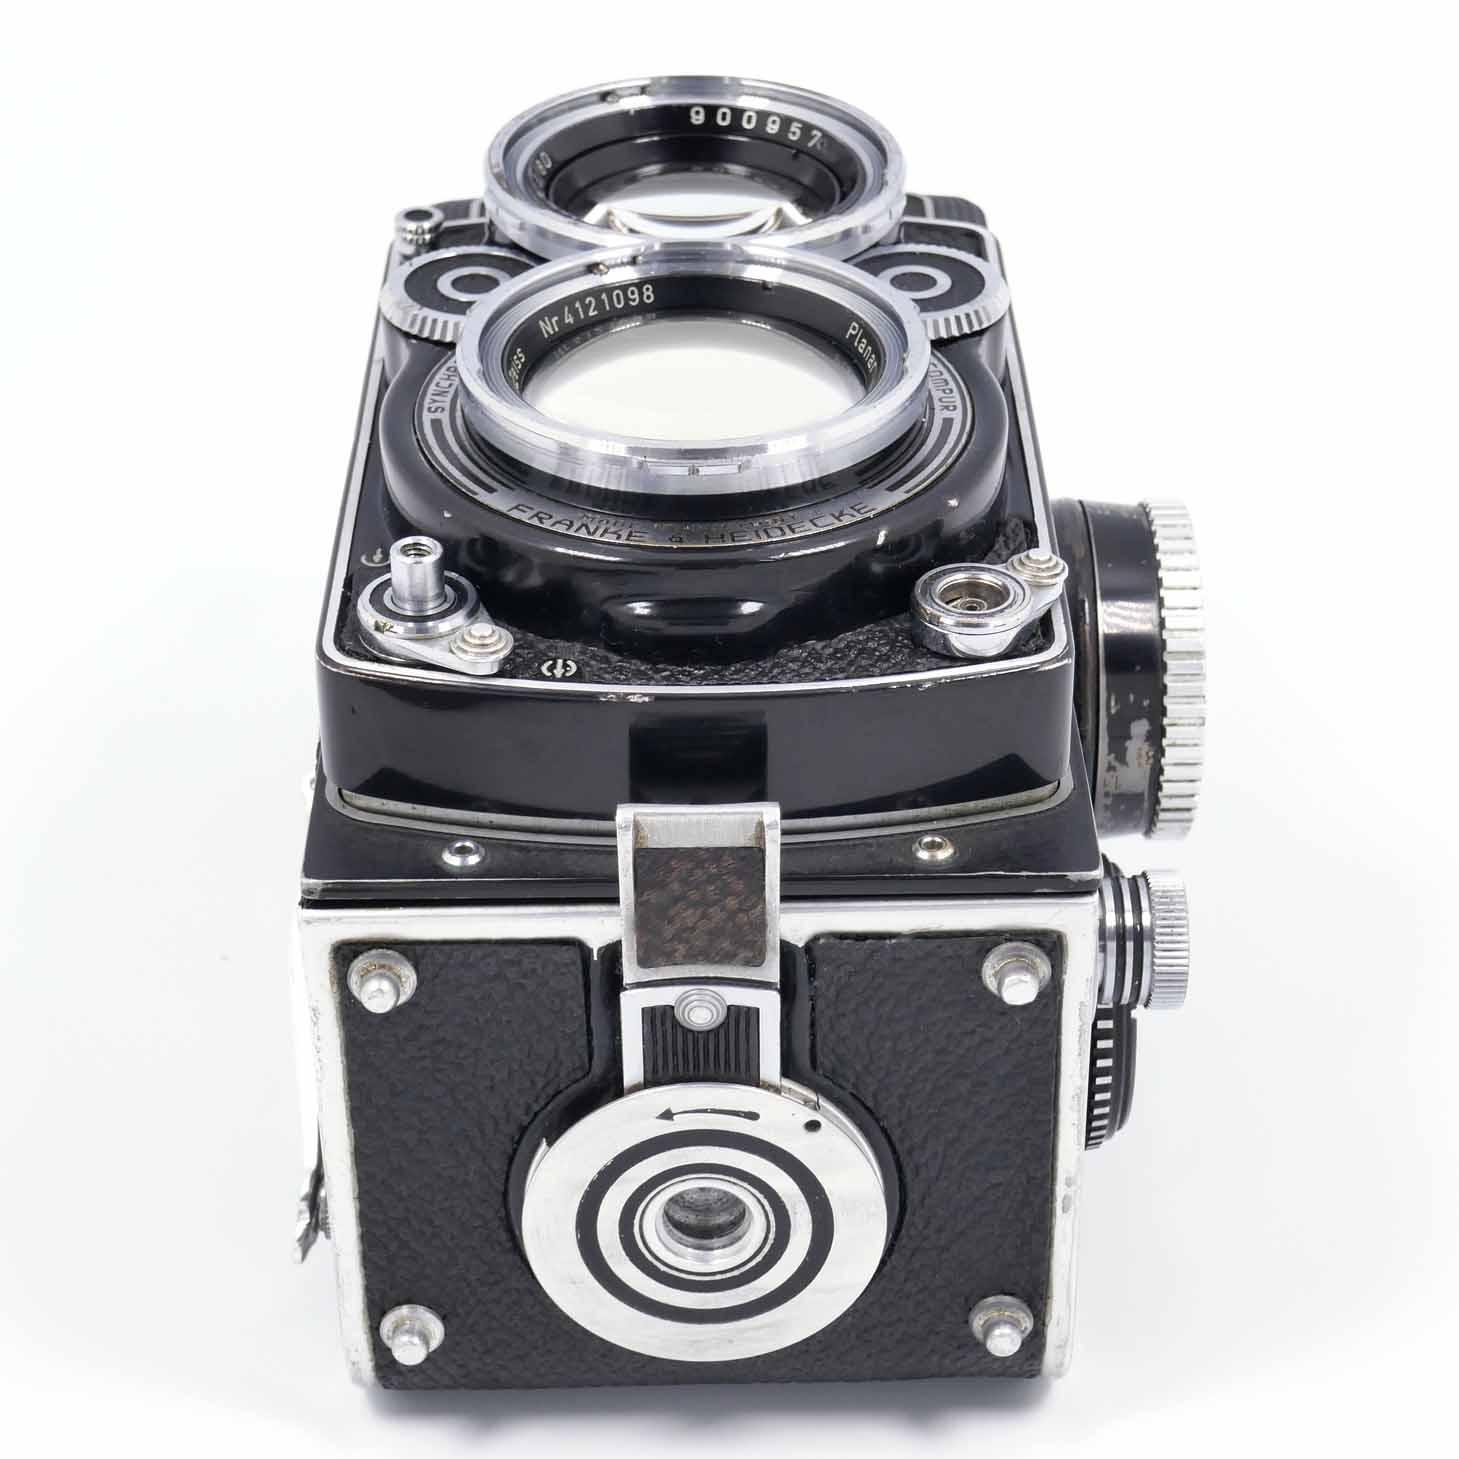 clean-cameras-Rolleiflex-2.8-F03